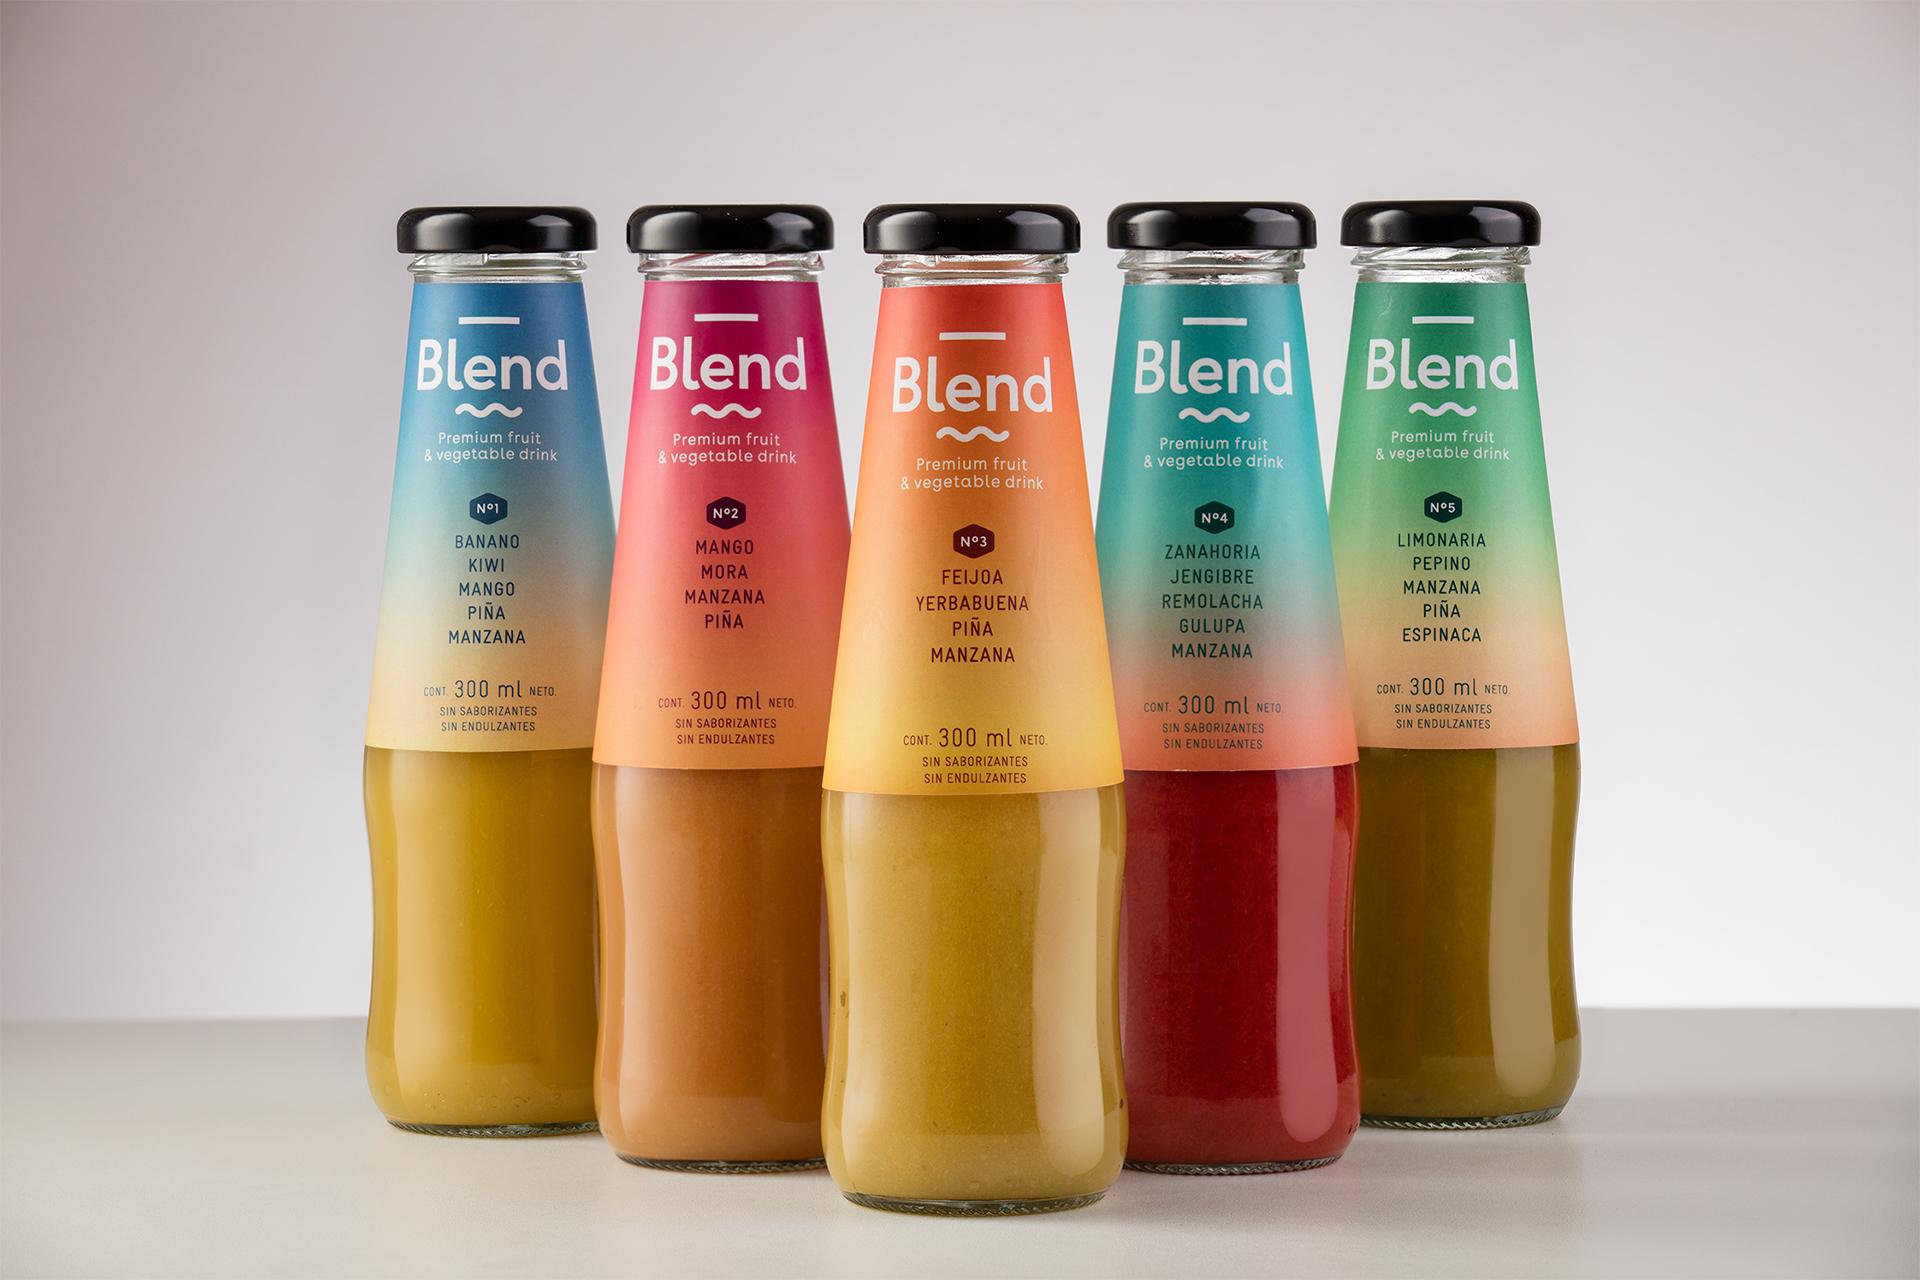 More packaging design via Behance